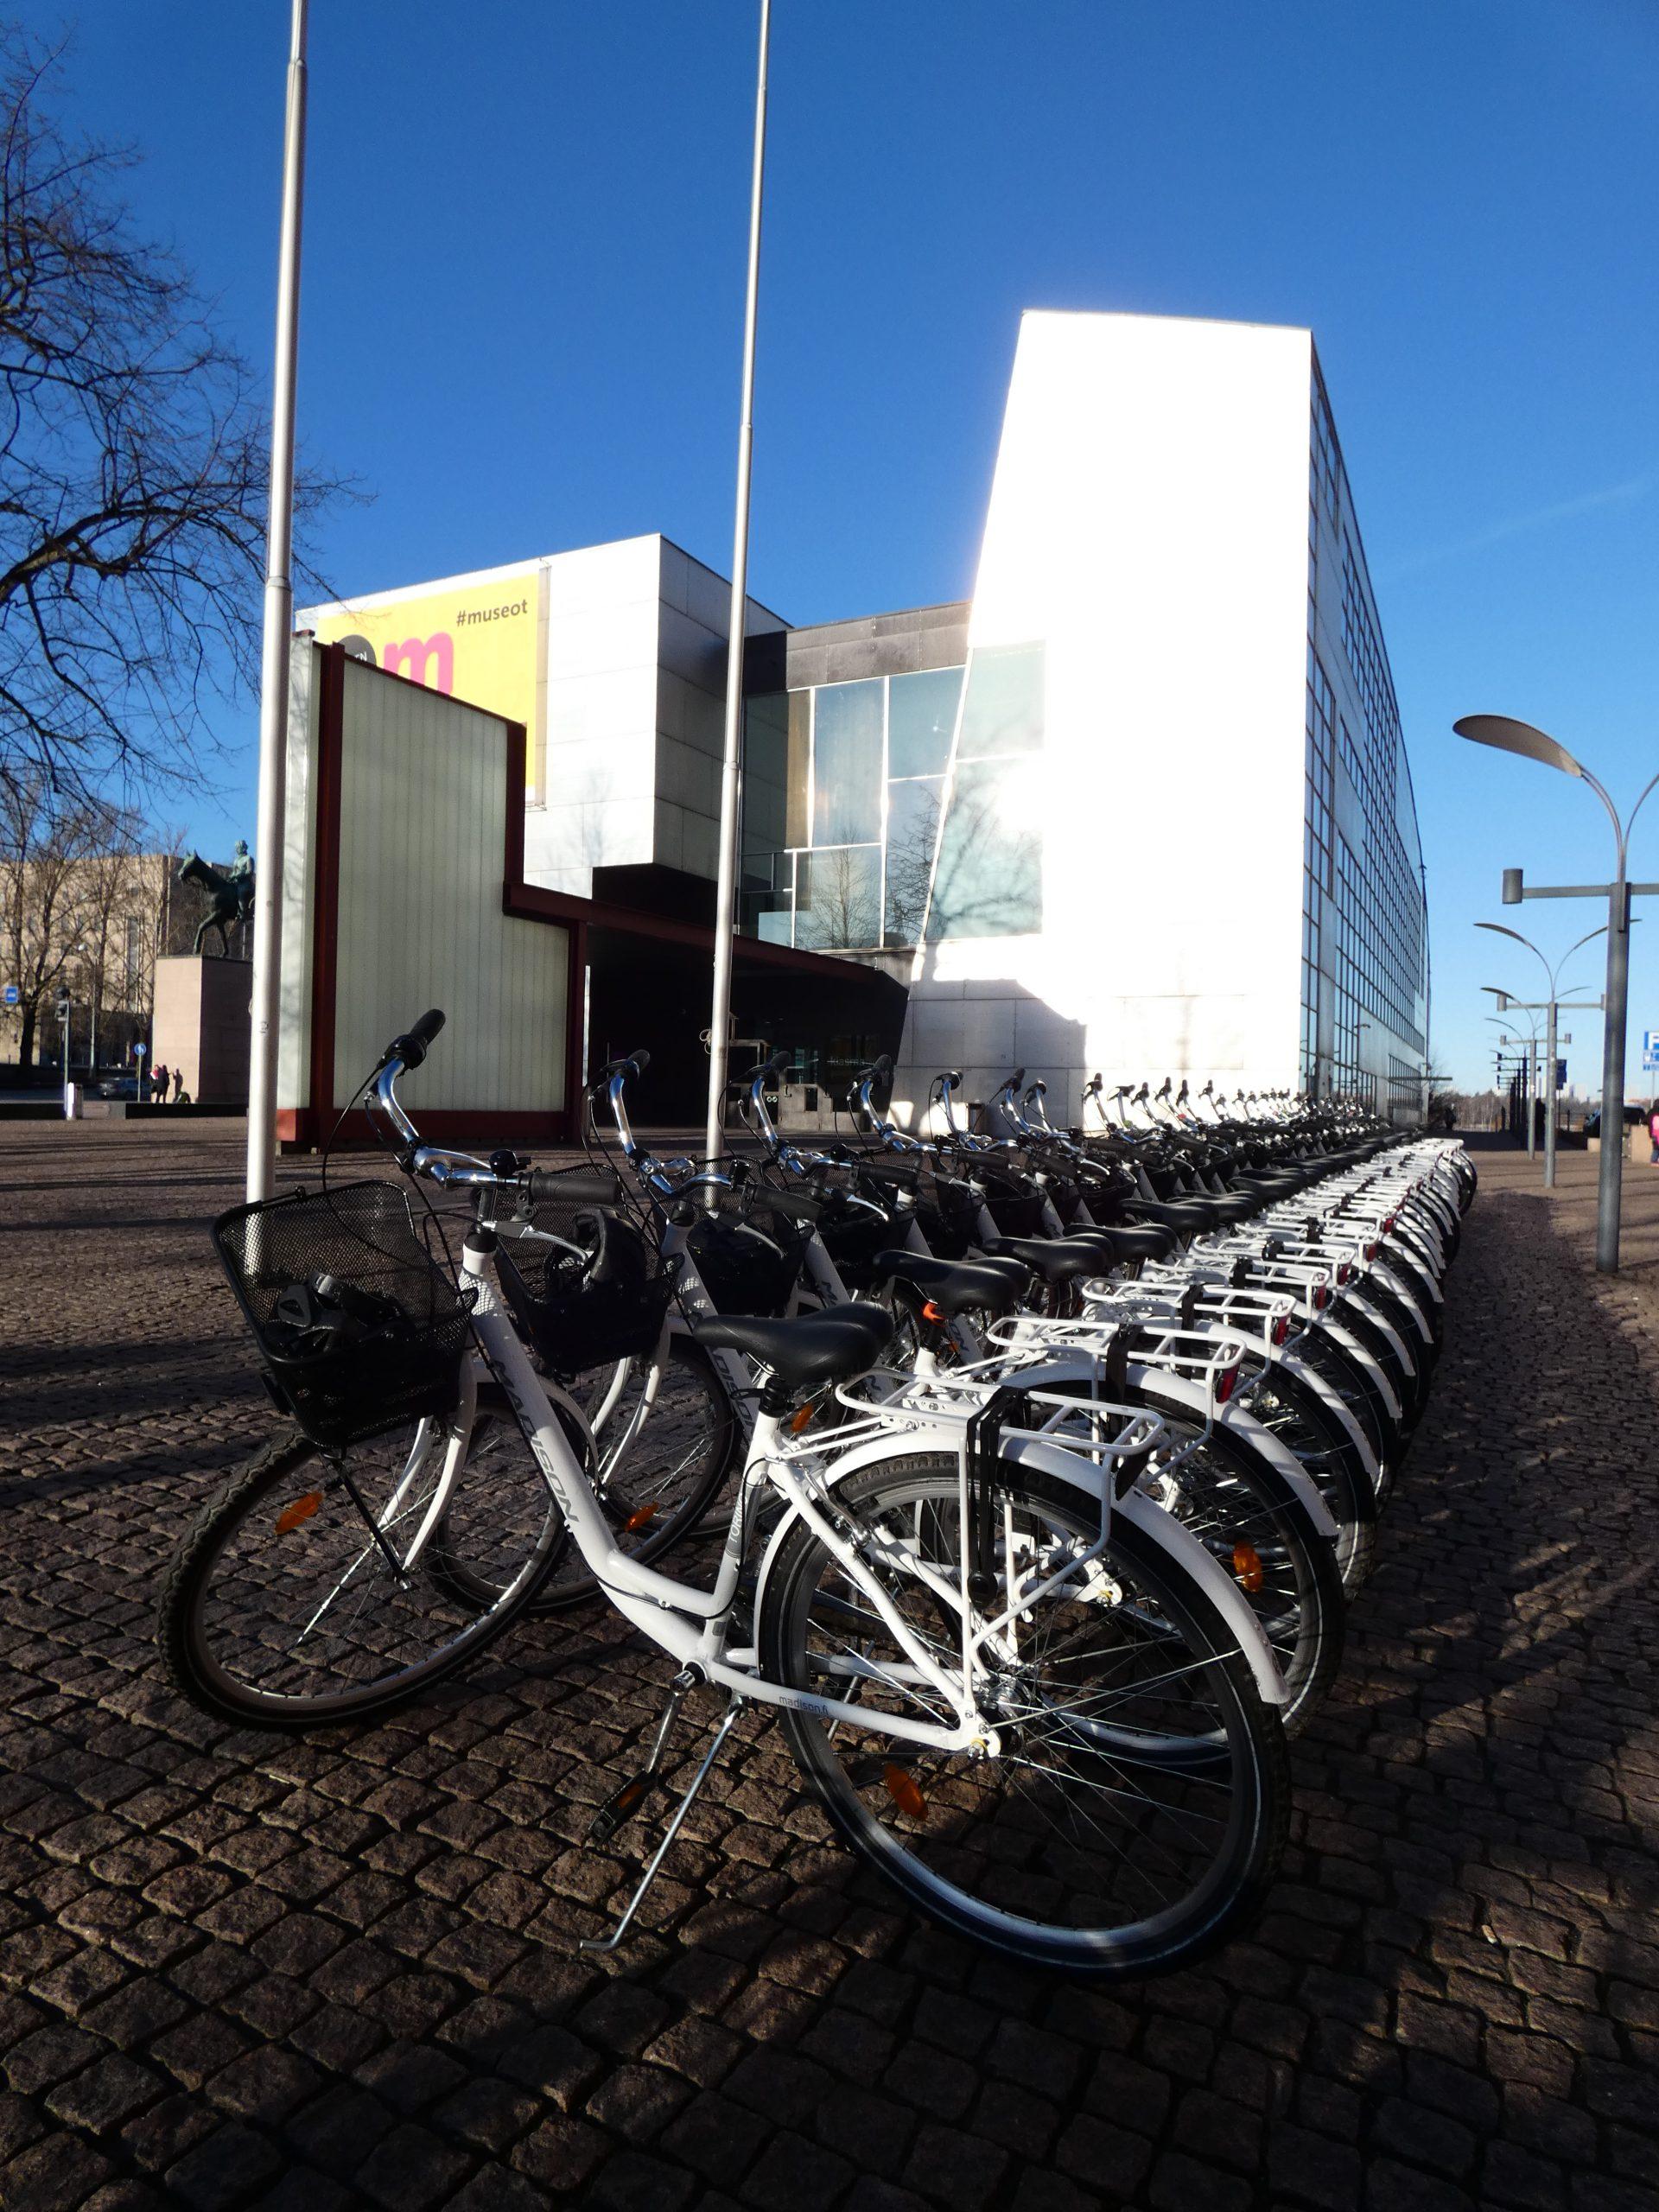 Bike rental service for groups.